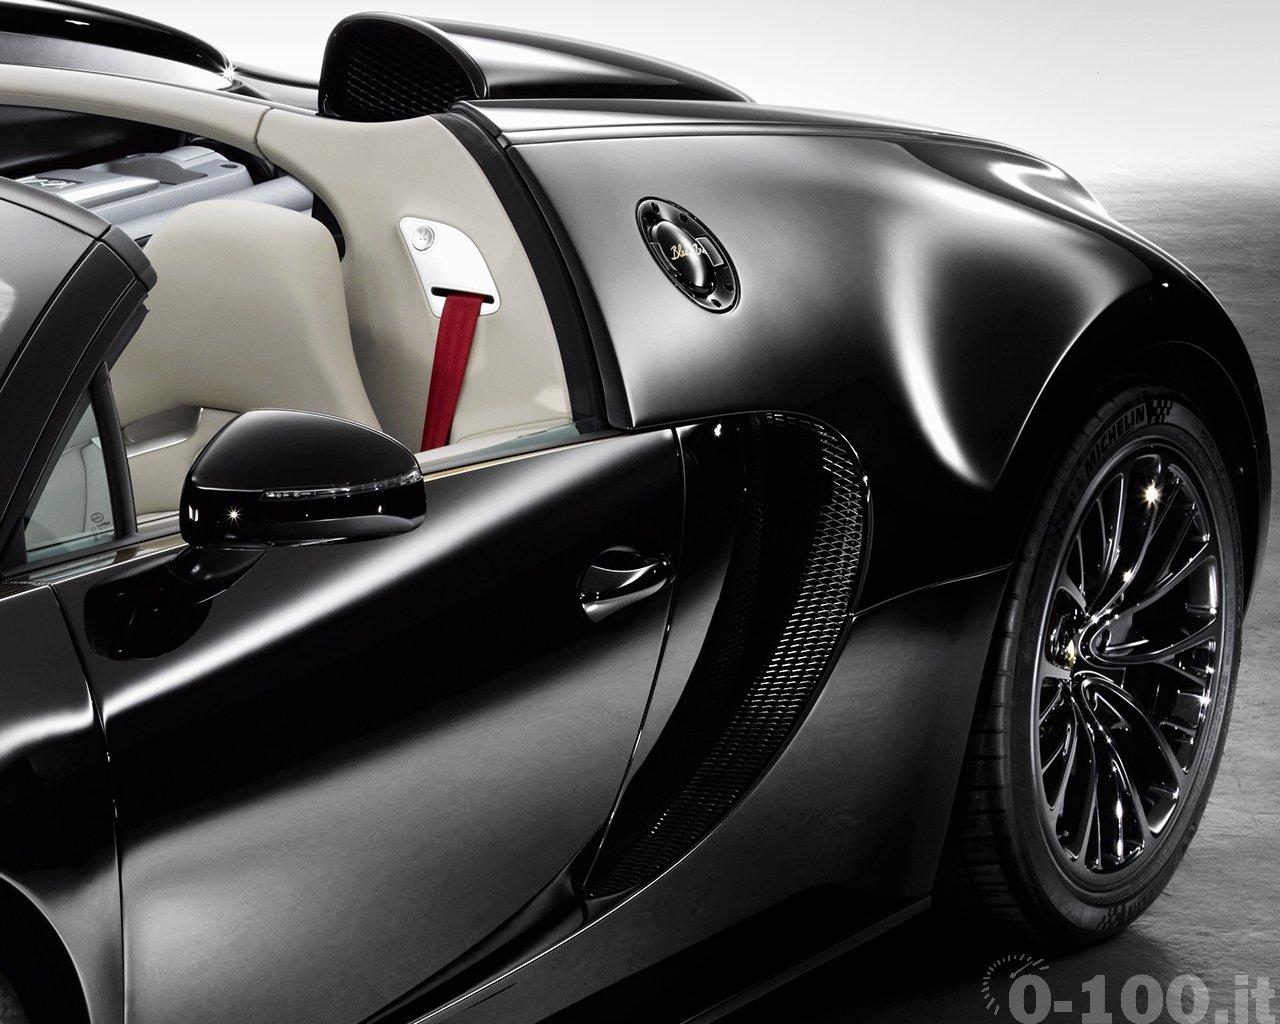 beijing-2014-bugatti-veyron-serie-speciale-les-legendes-de-bugatti-veyron-16-4-grand-sport-vitesse-black-bess_19